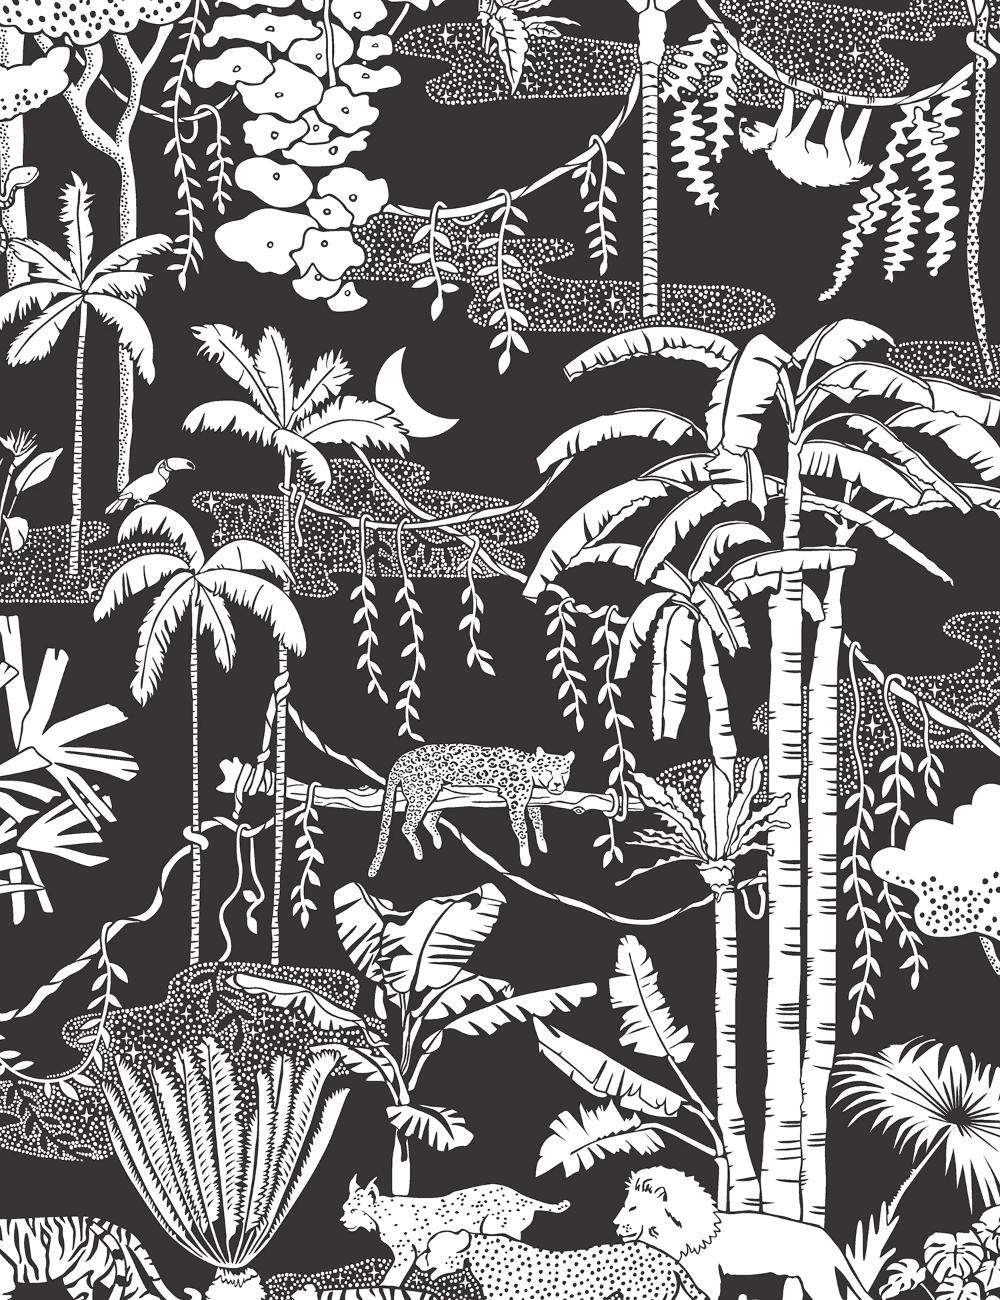 Jungle Dream Contrast Vinyl wallpaper, Jungle pattern